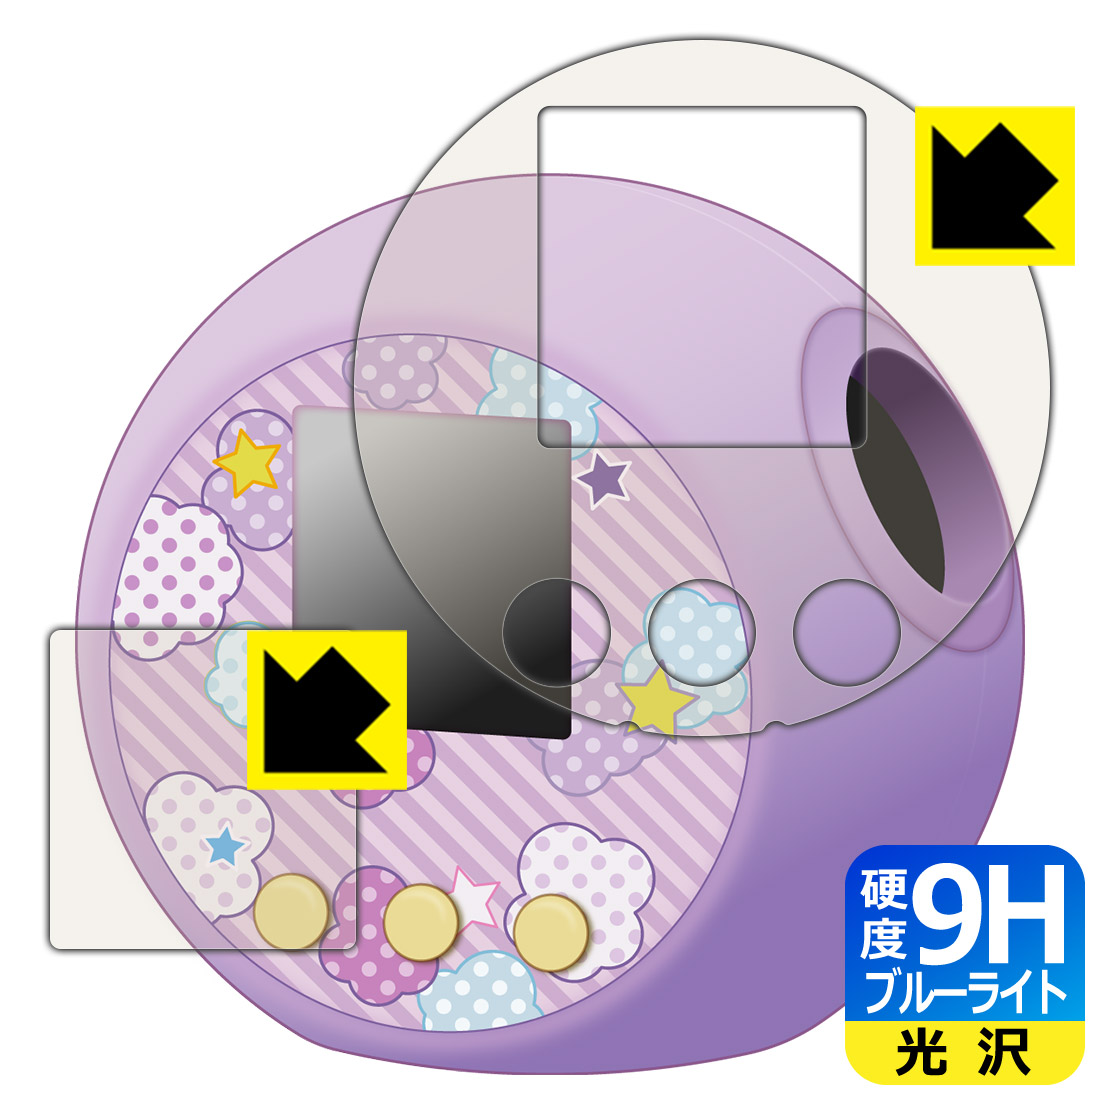 9H高硬度 ブルーライトカット タイプ ぷにるんず 用 画面用 保護フィルム 専用保護フィルム 即出荷 smtb-kd ふち用 販売実績No.1 2枚組 保護シート